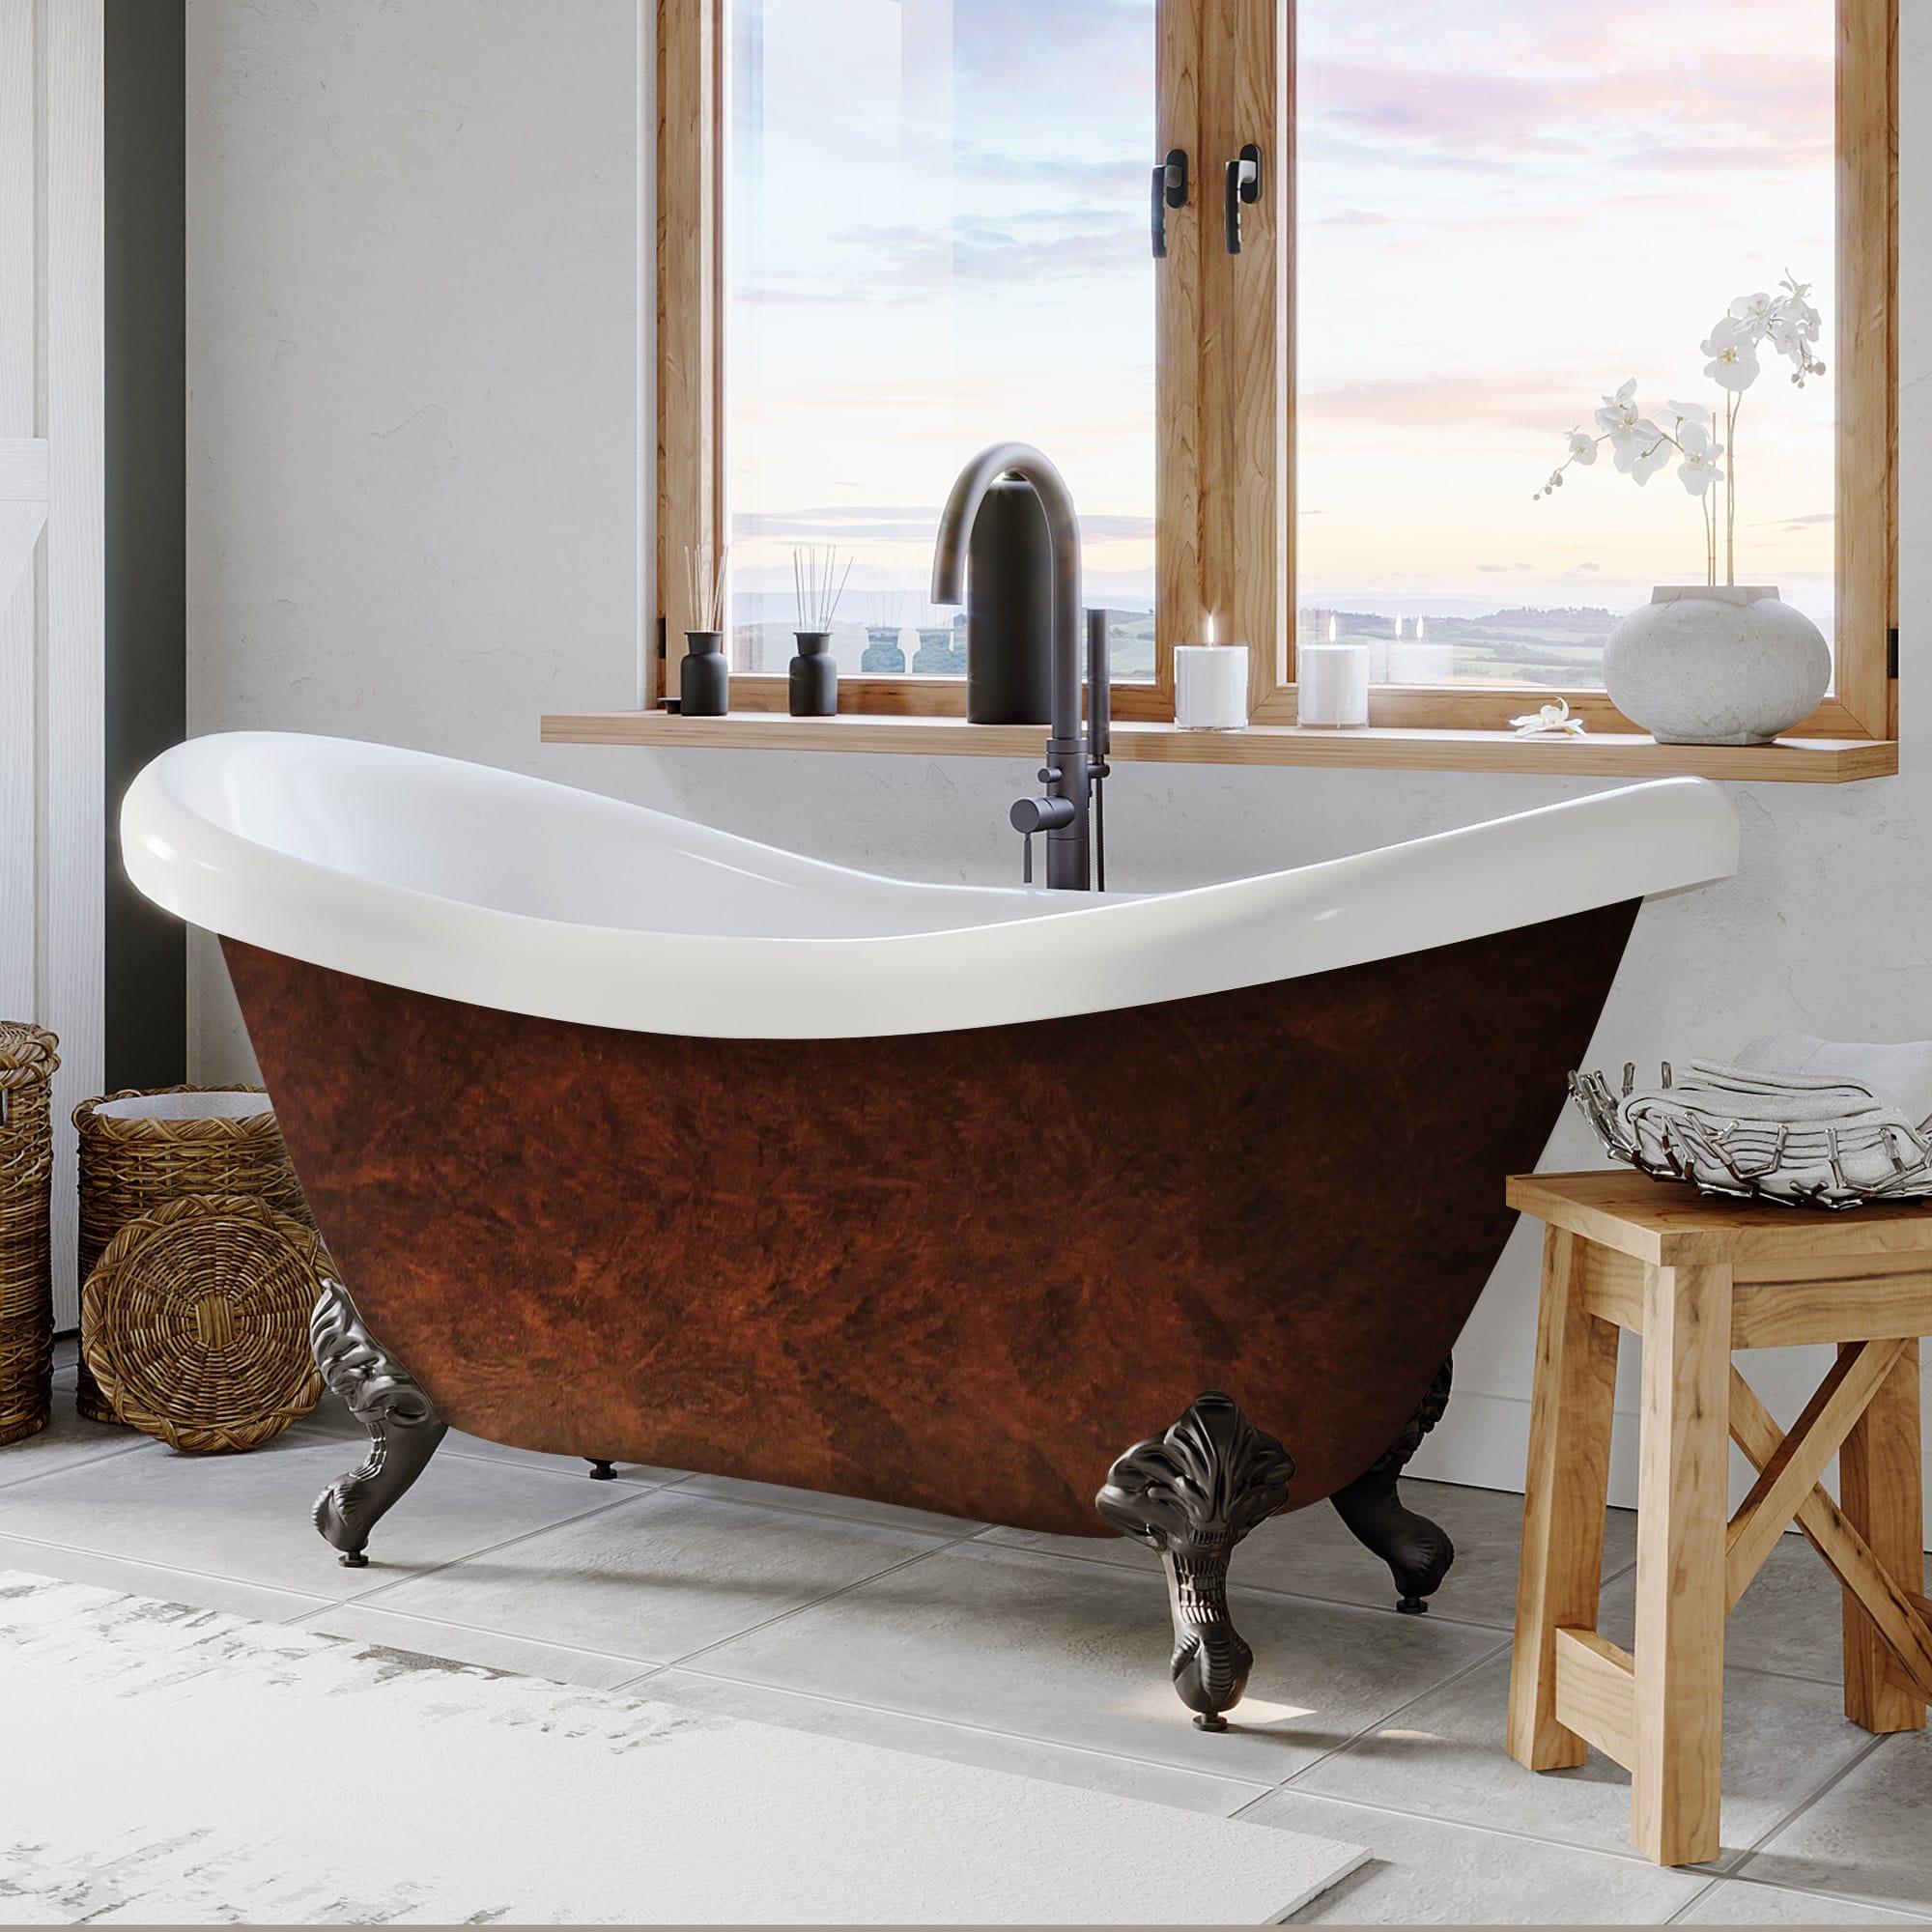 69 Inch Acrylic Copper Bronze Double Slipper Clawfoot Tub